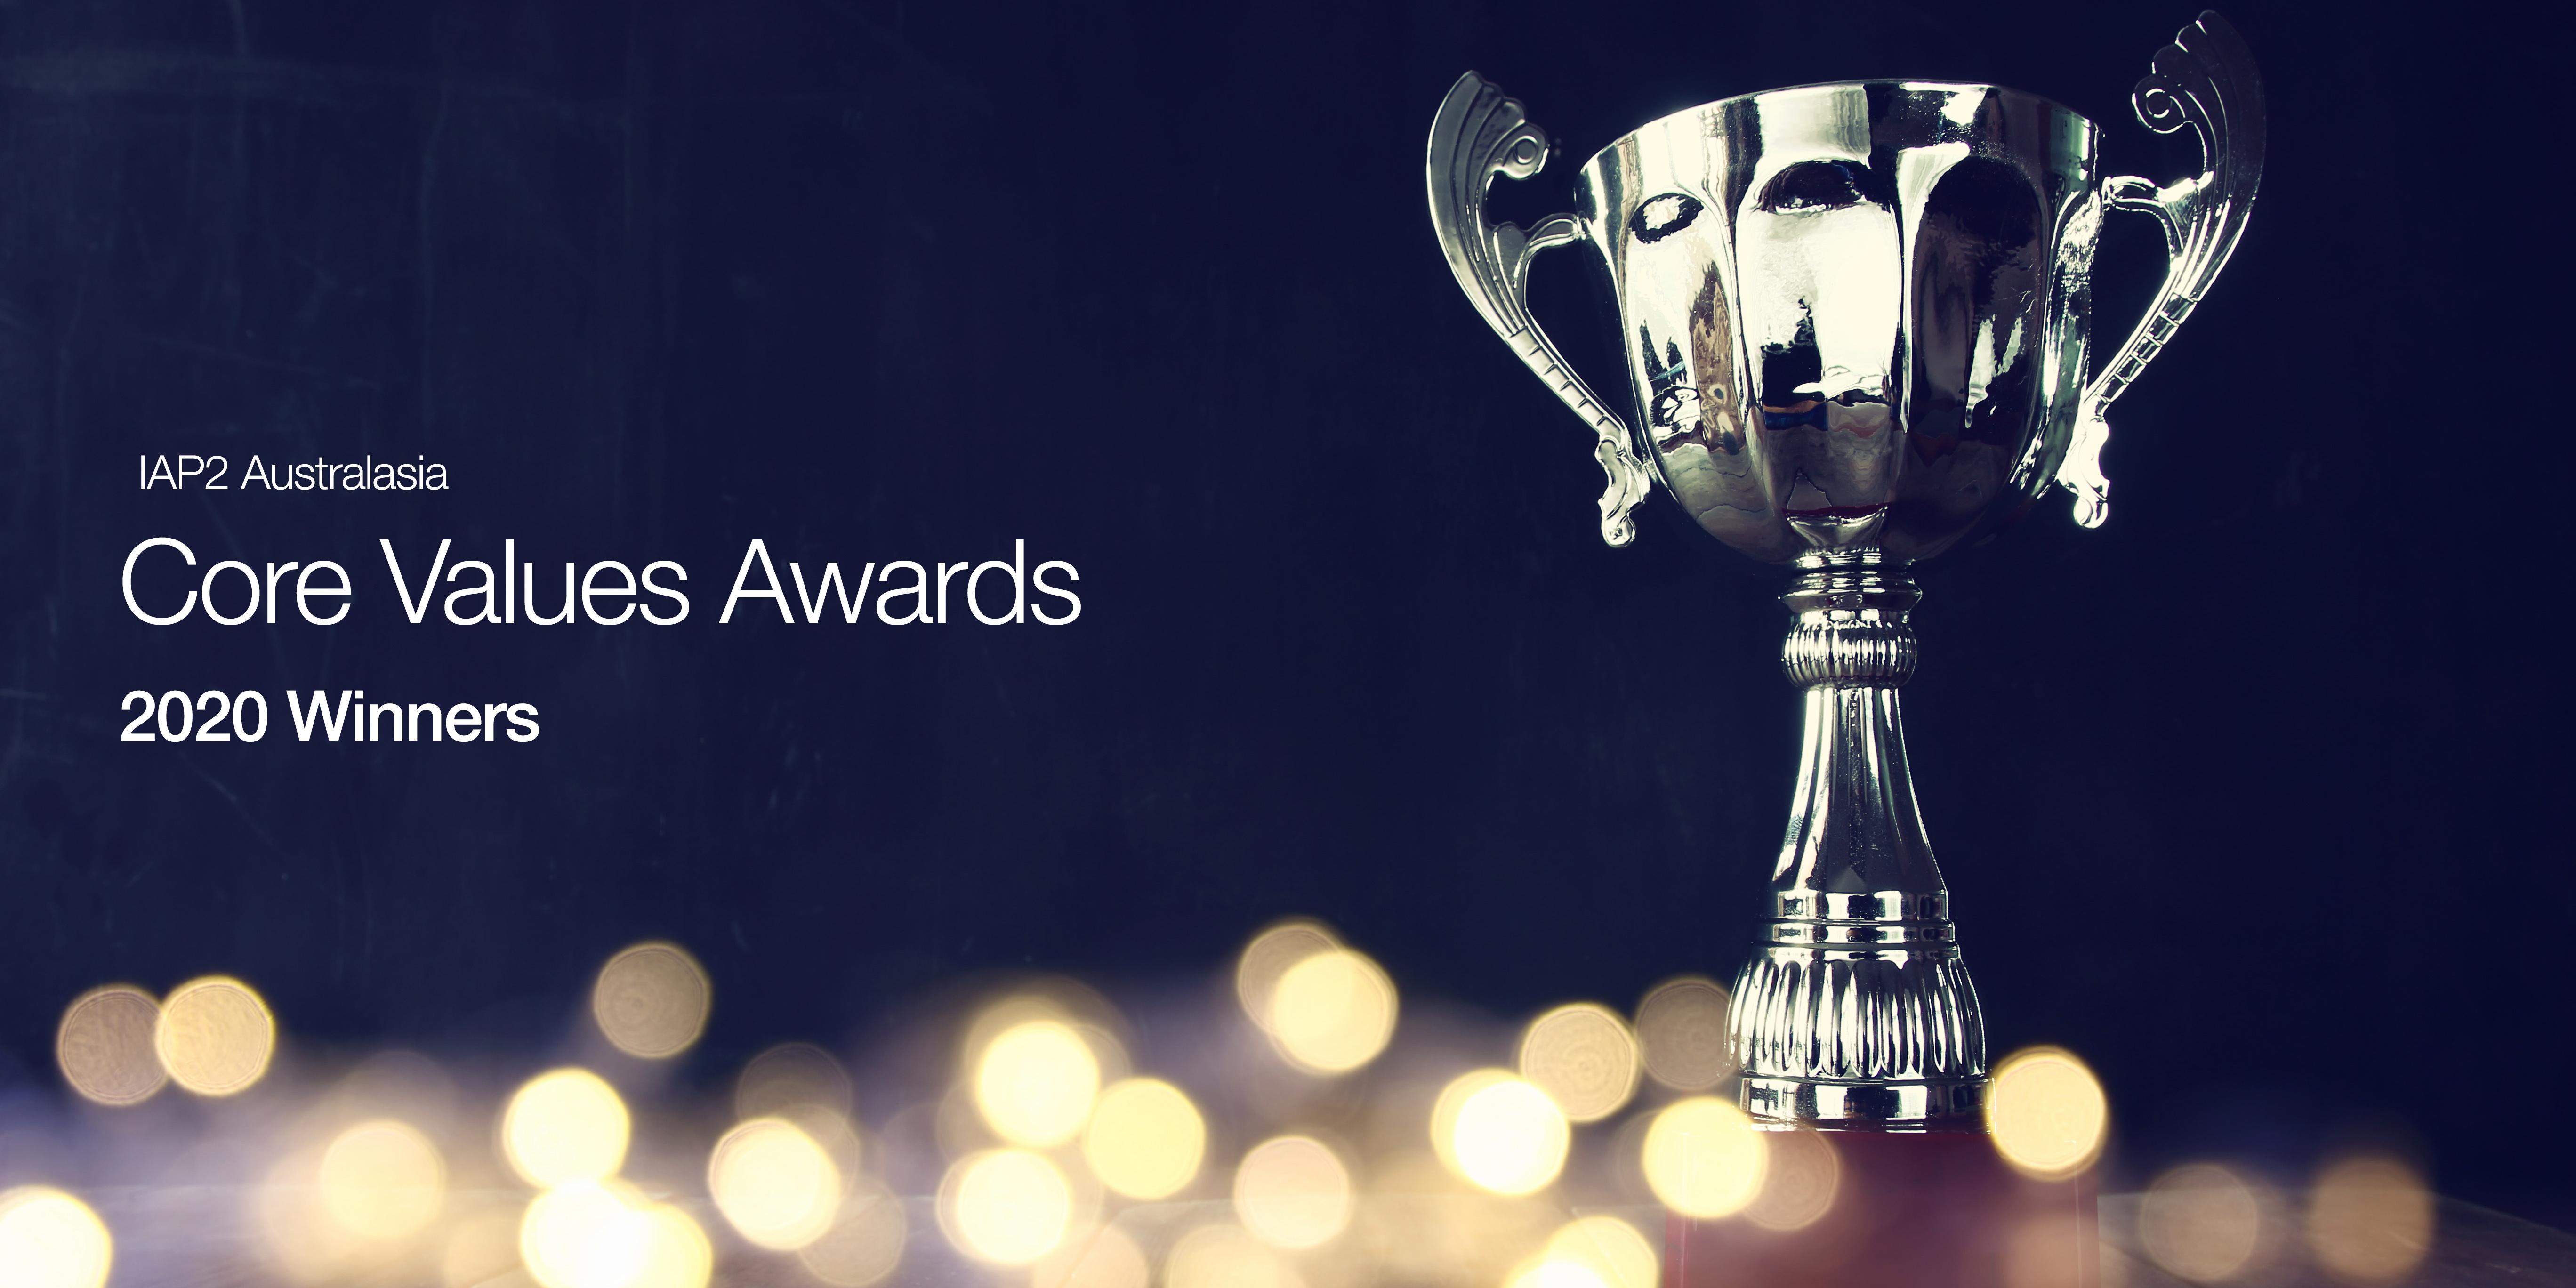 2020 Core Values Awards winners trophy banner